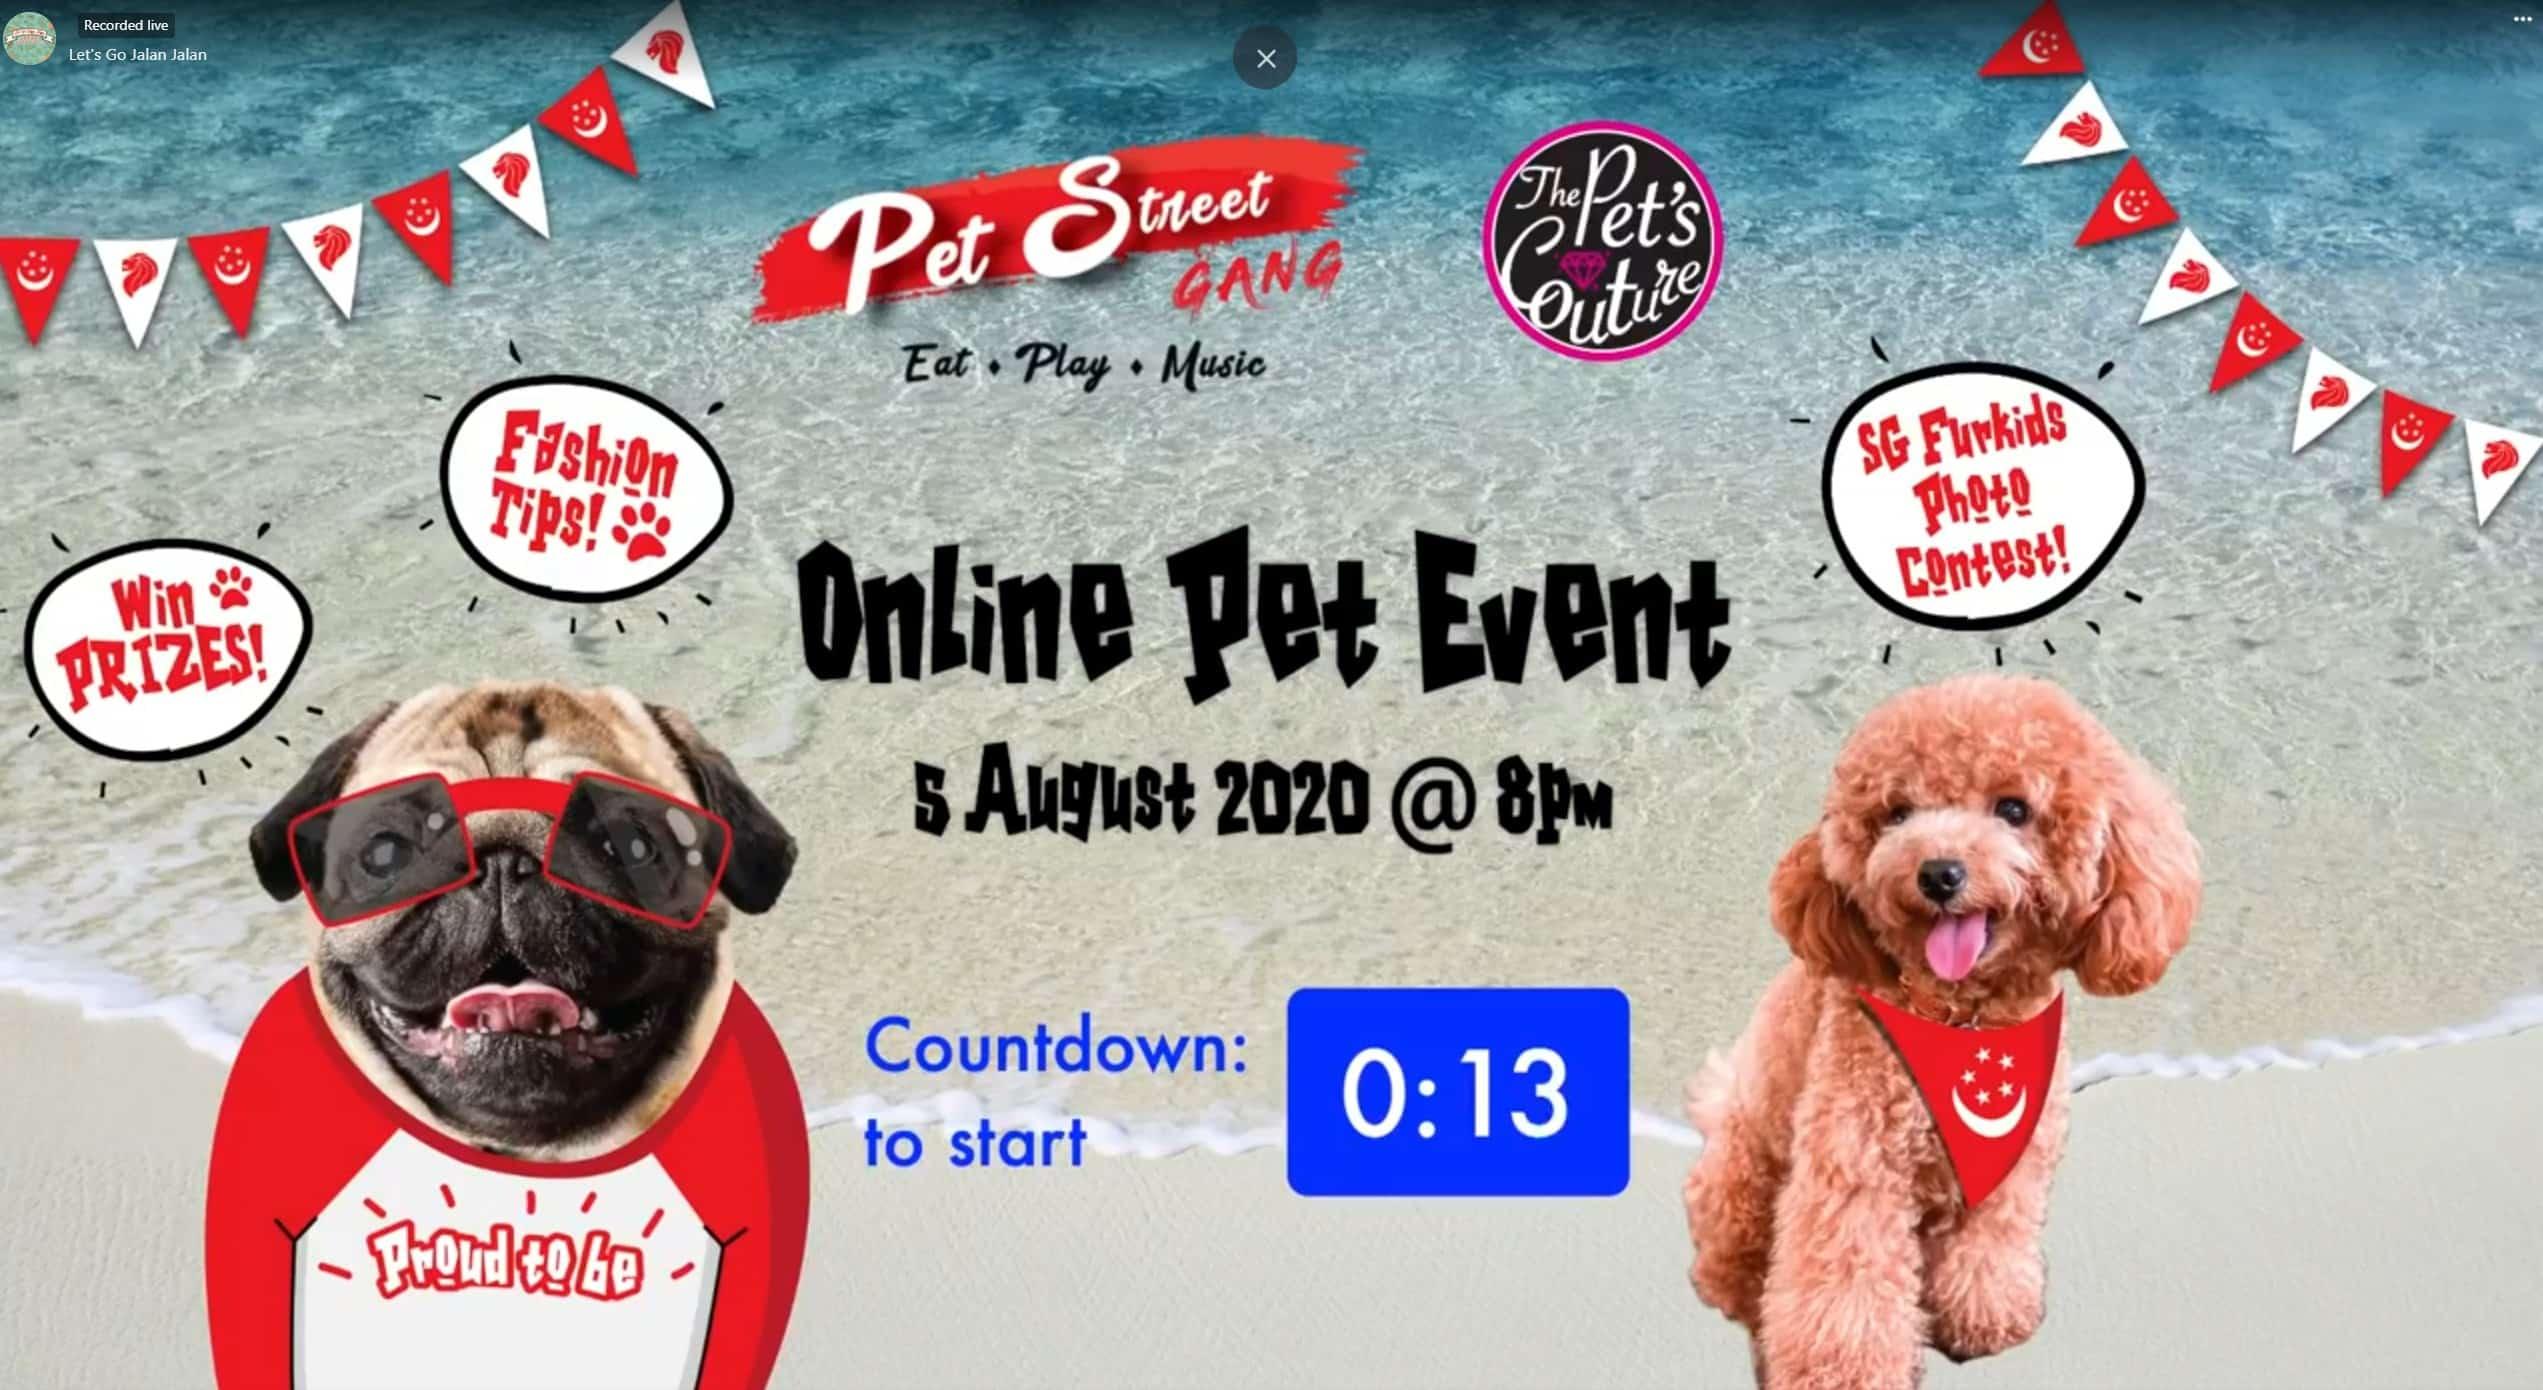 Professional Emcee Singapore James Yang Pet Street Gang Virtual Event